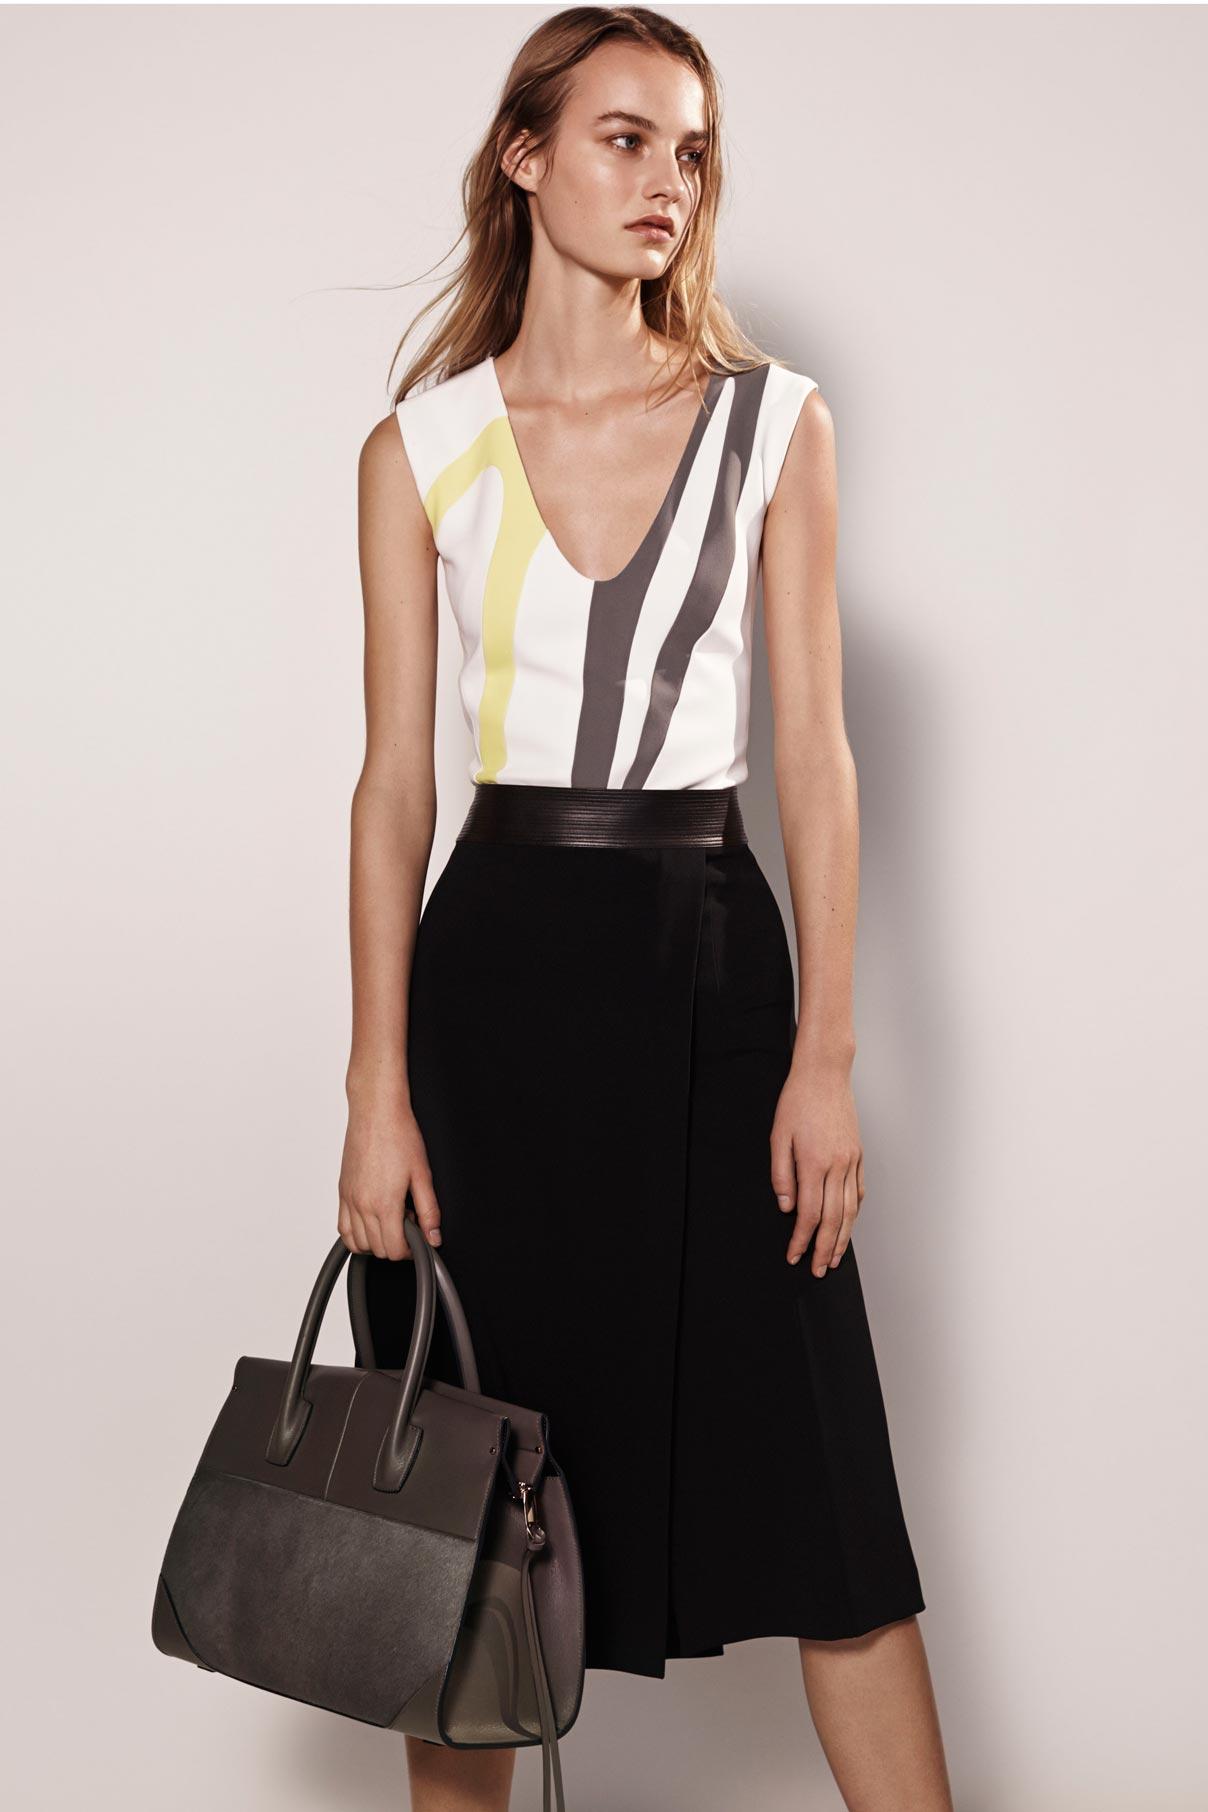 Look 7 Black/white/yellow silk crepe graphic dress.